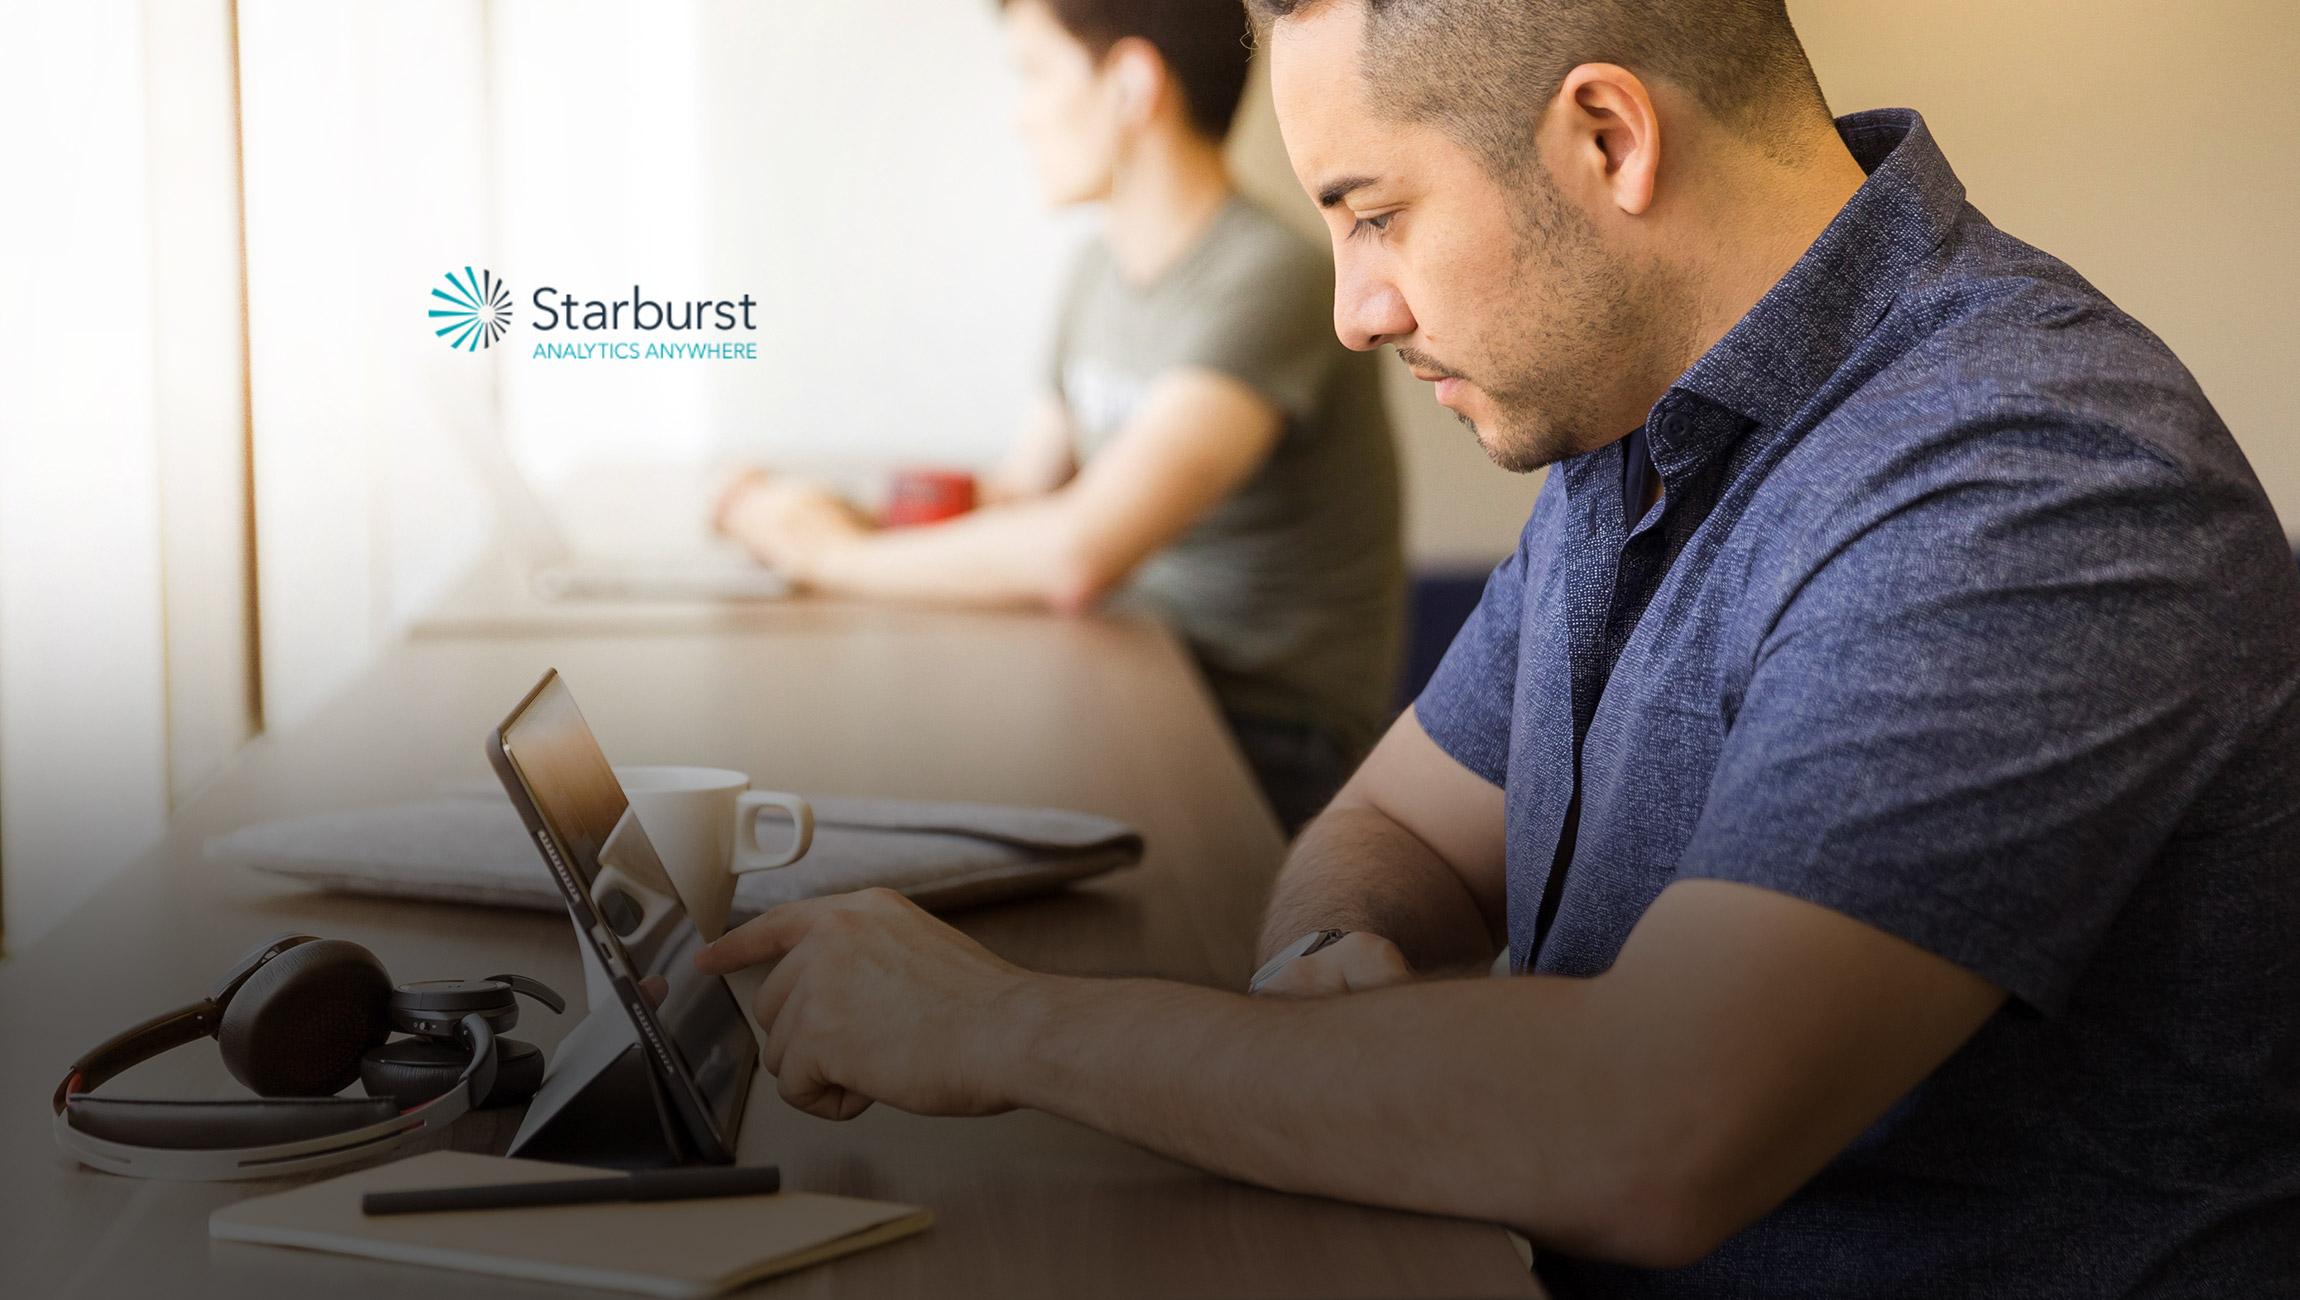 Original Presto Co-Creators Reunite on the Starburst Technical Leadership Team